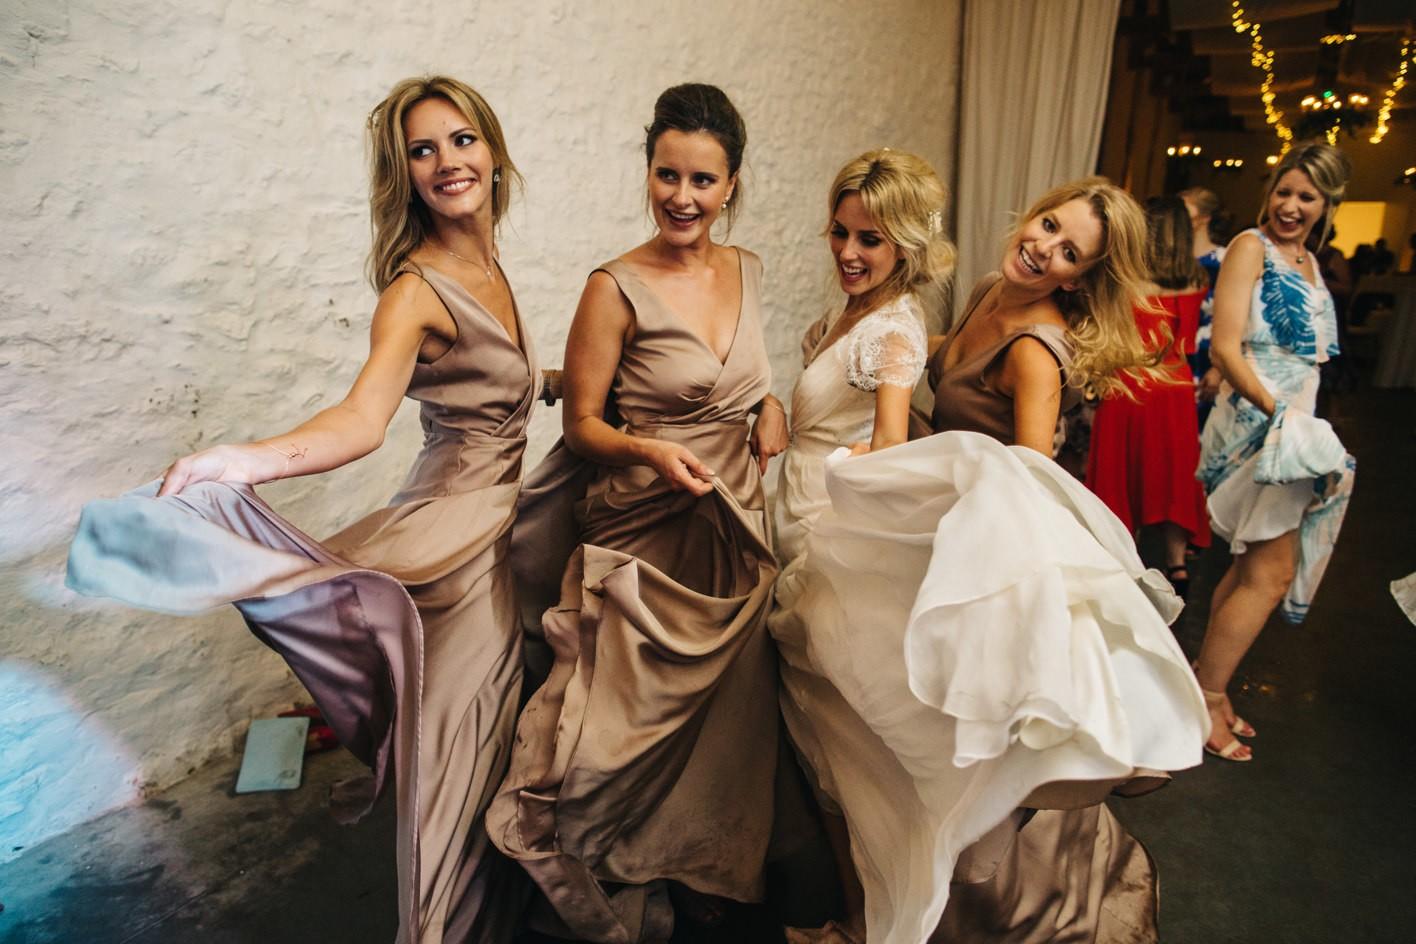 shaking wedding dresses